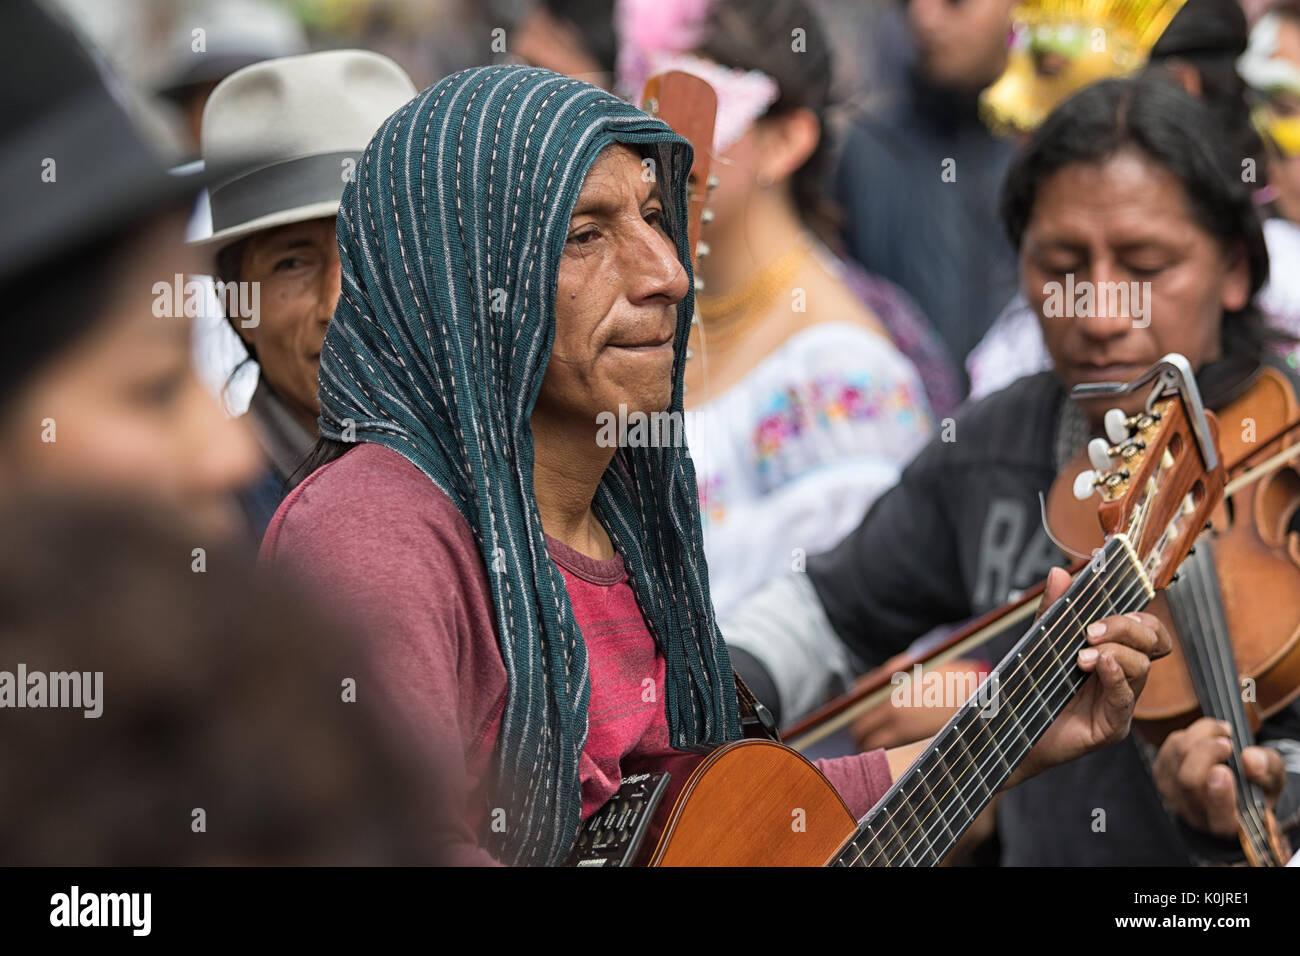 July 1, 2017 Cotacachi, Ecuador: an indigenous Kichwa man playing the guitar during Punchi Warmi celebration - Stock Image